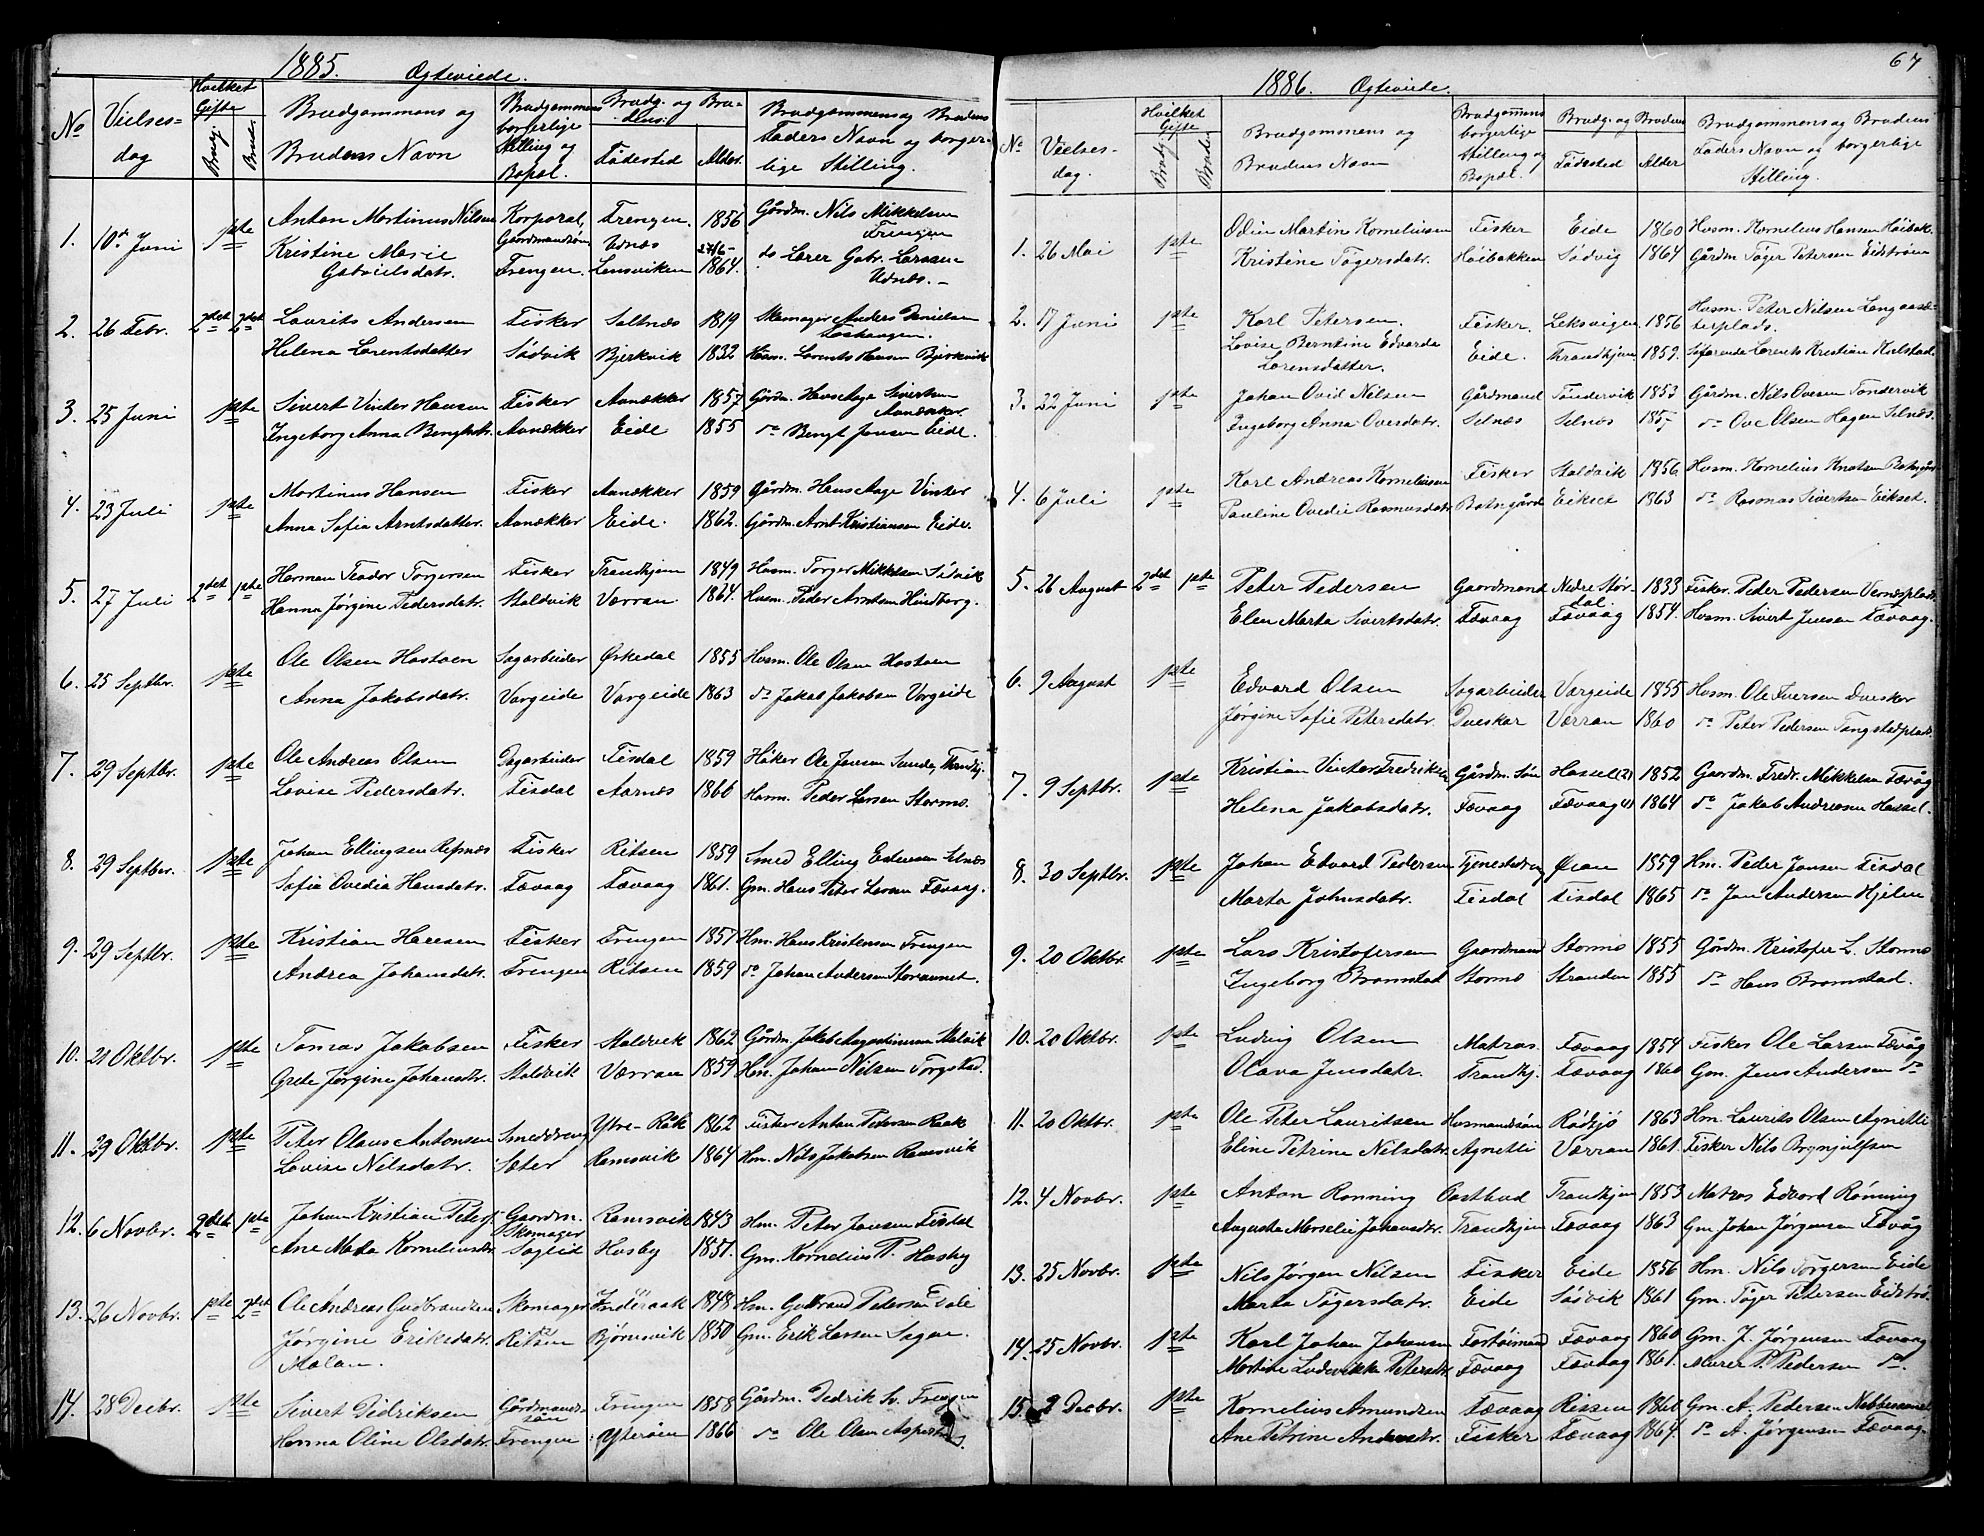 SAT, Ministerialprotokoller, klokkerbøker og fødselsregistre - Sør-Trøndelag, 653/L0657: Parish register (copy) no. 653C01, 1866-1893, p. 67